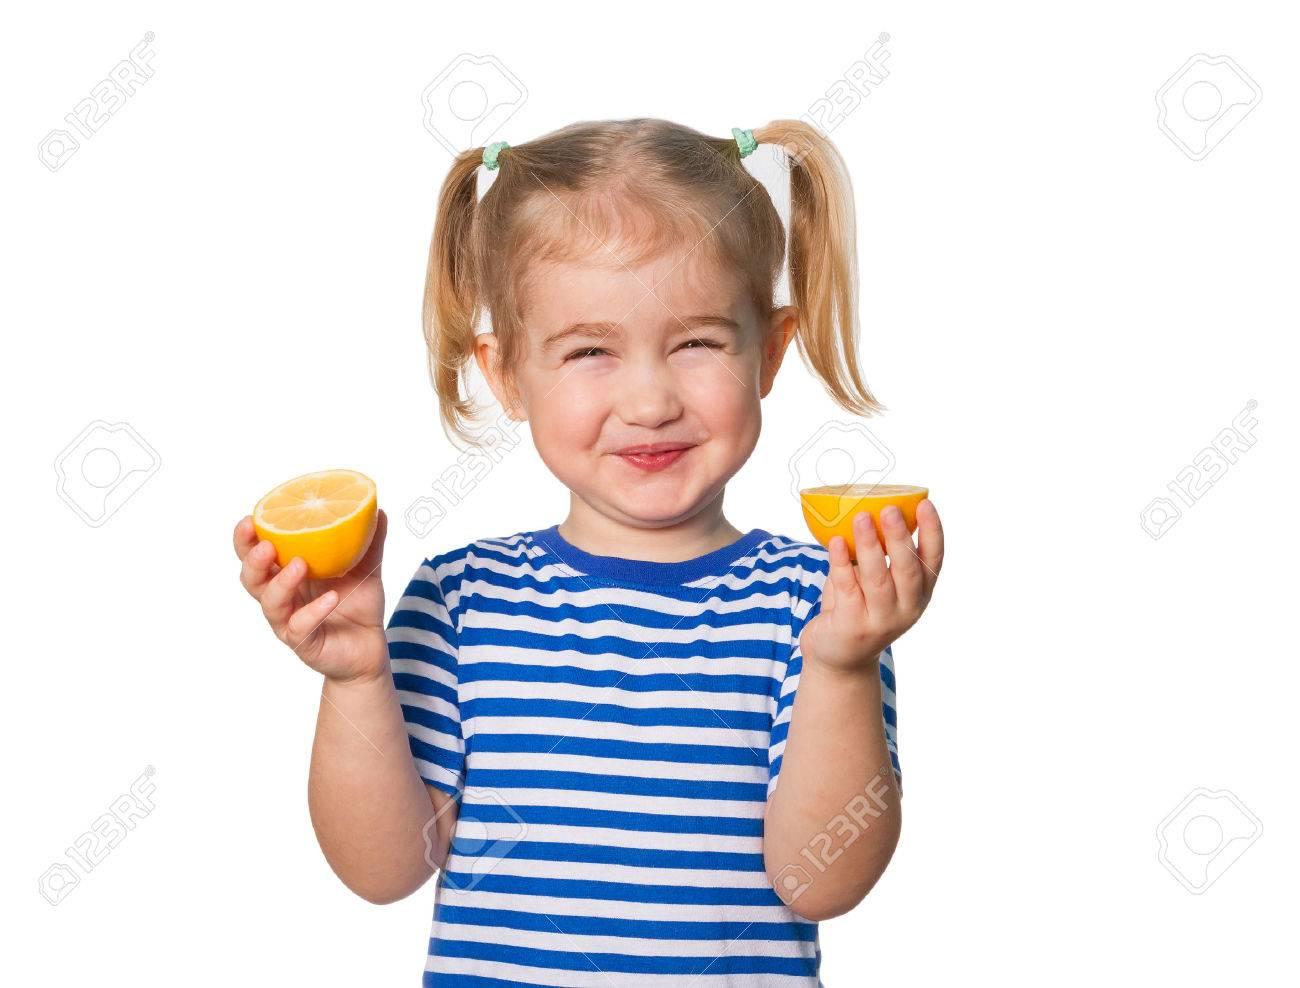 Little Funny girl in striped shirt keeps lemons. Isolated on white background - 50884728